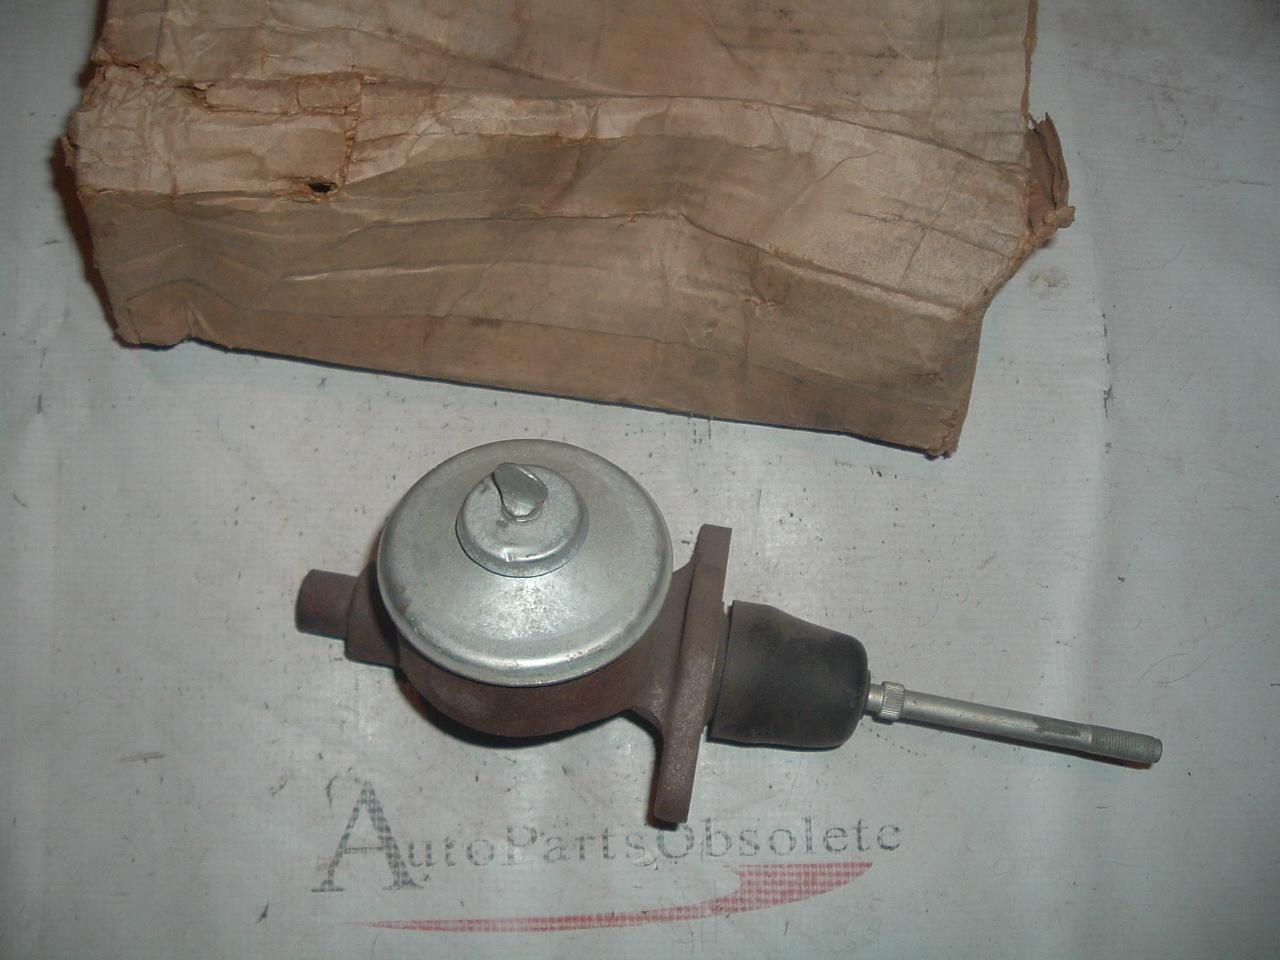 1964 65 pontiac gran prix bonneville master brake cylinder # 5460977 (z 5460977)